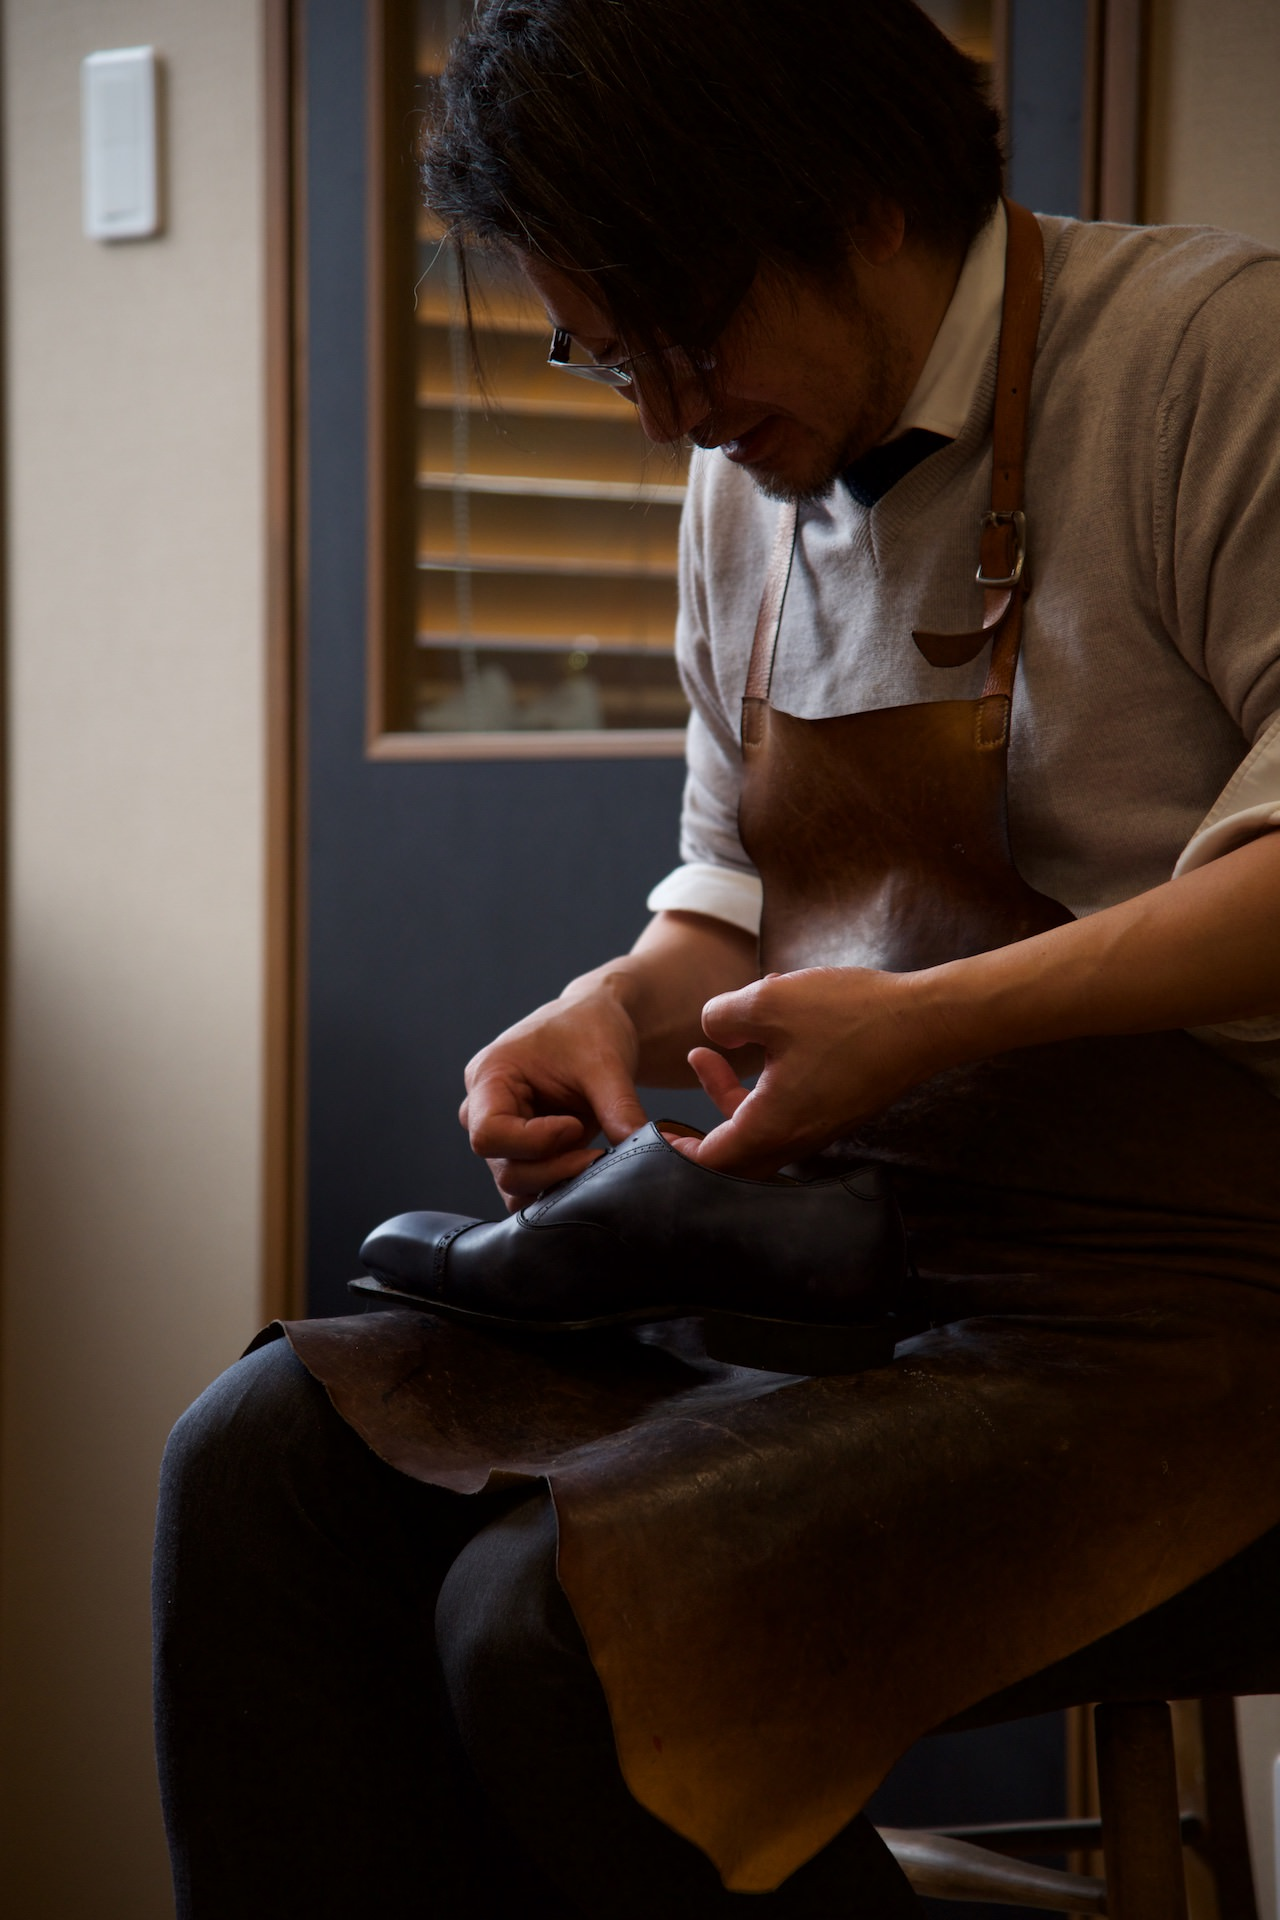 Seigaku san - bespoke shoemaker